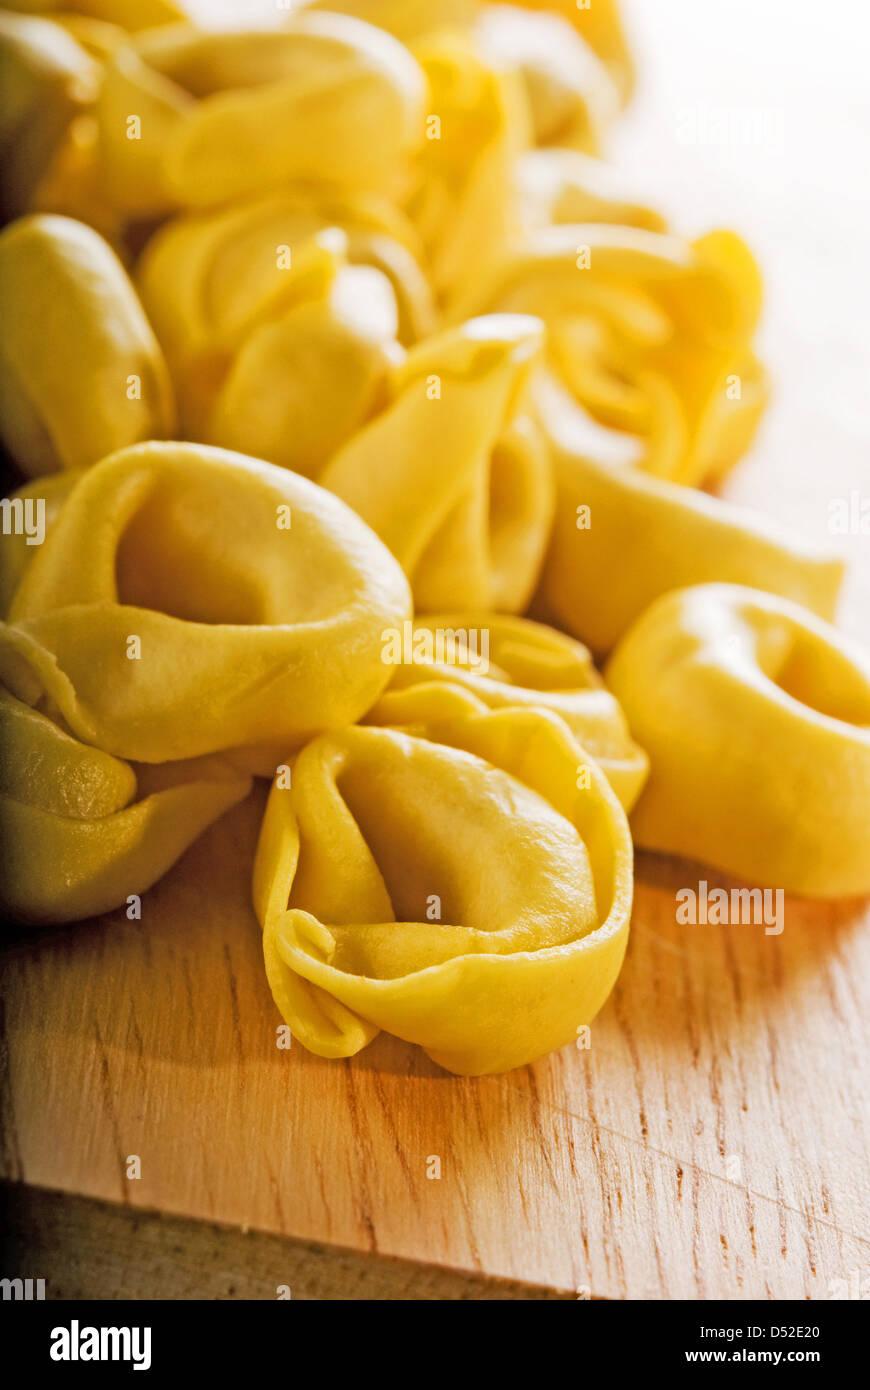 ravioli, traditional Italian filled pasta - Stock Image